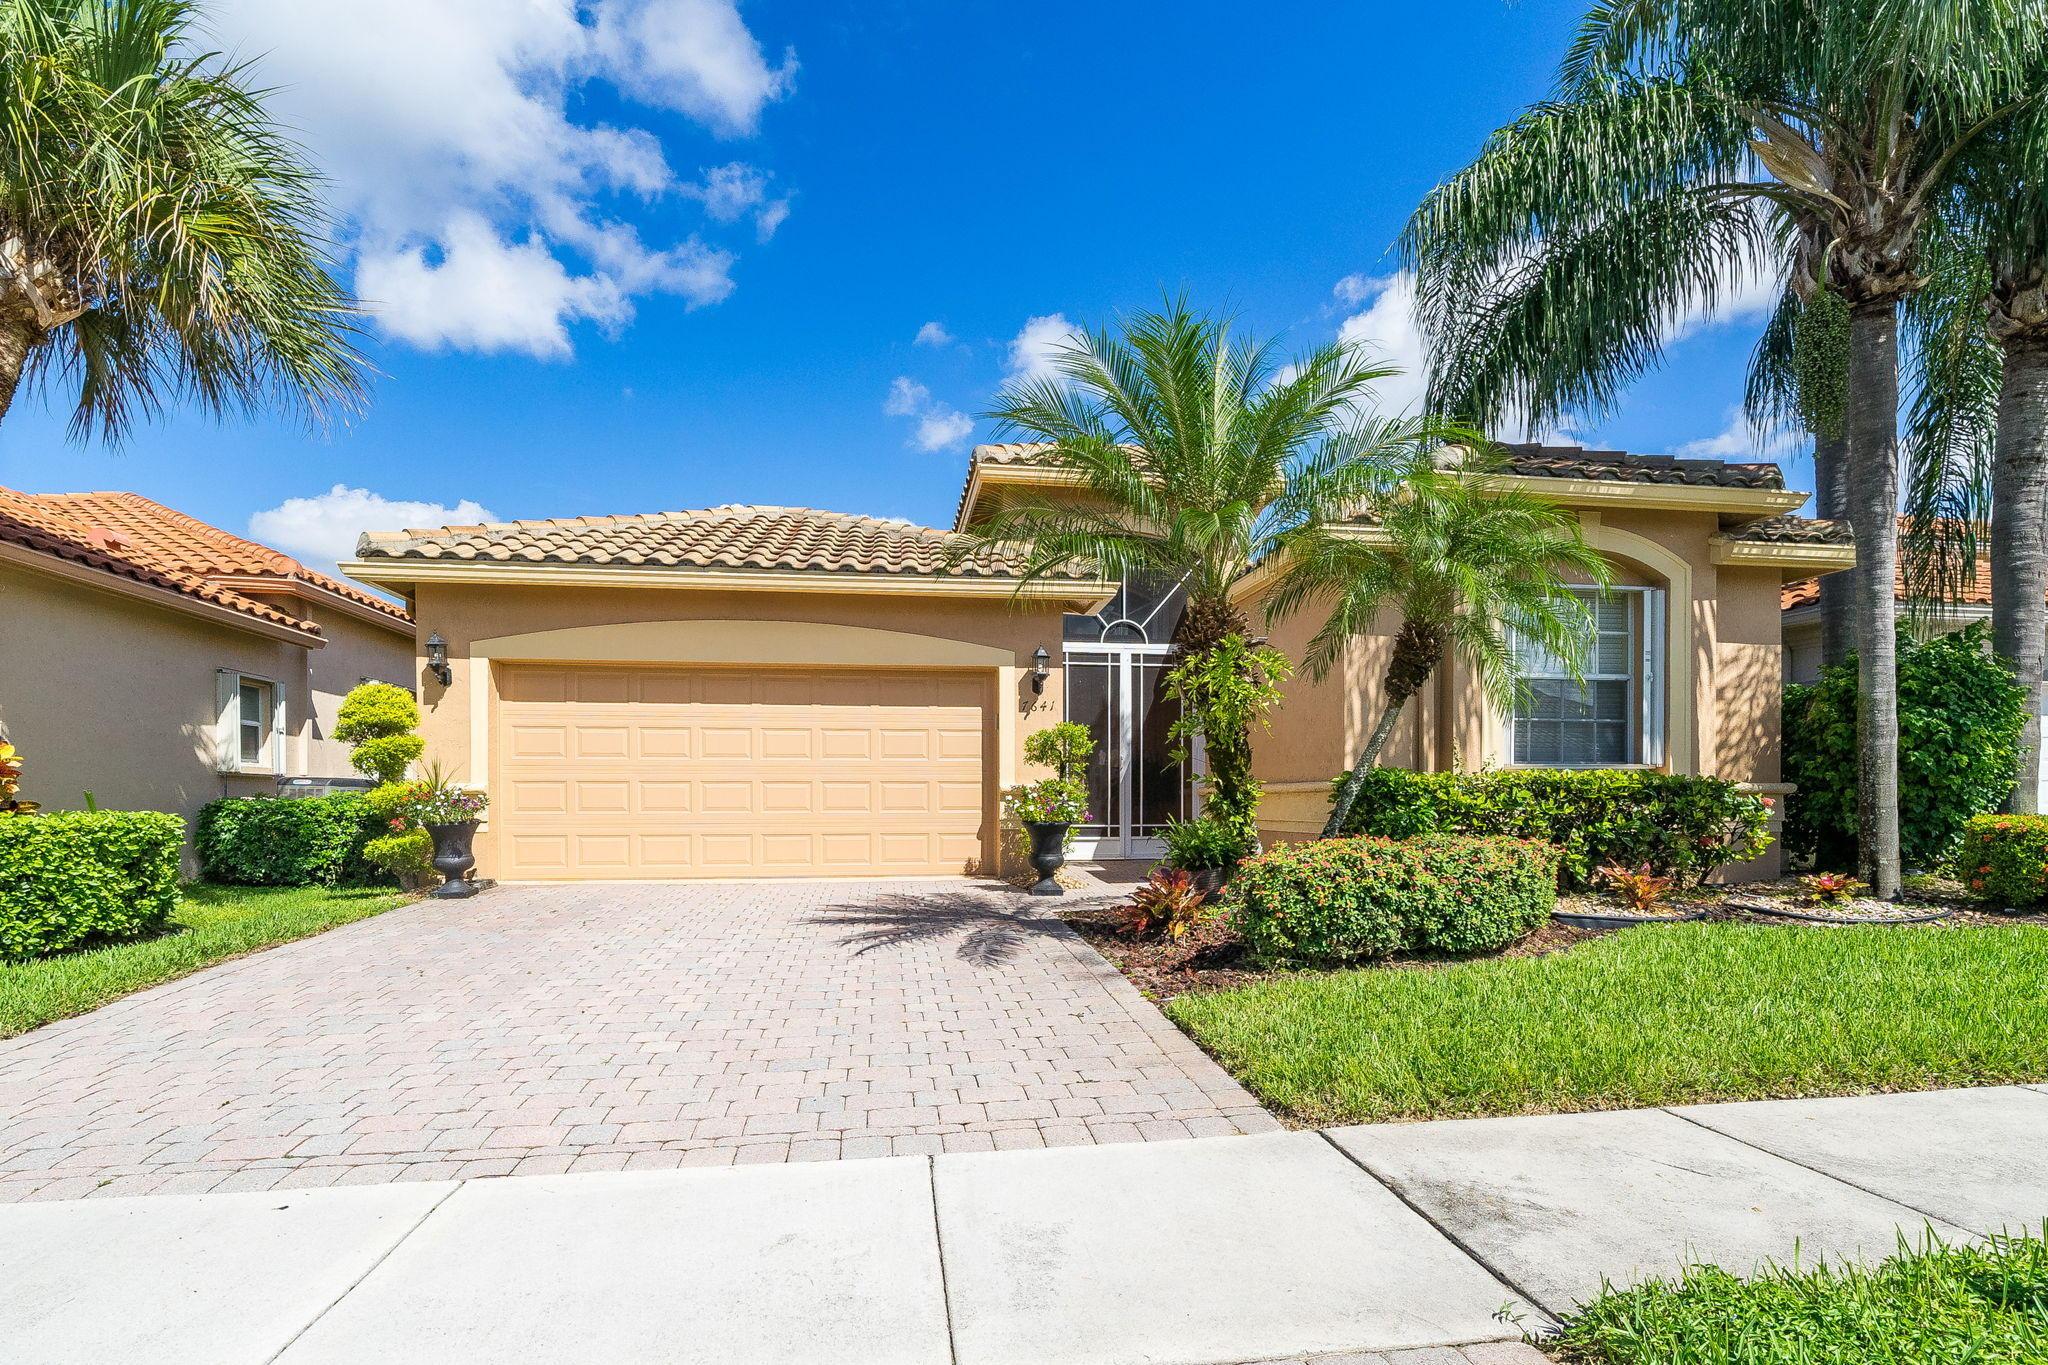 Photo of 7641 Viniste Drive, Boynton Beach, FL 33472